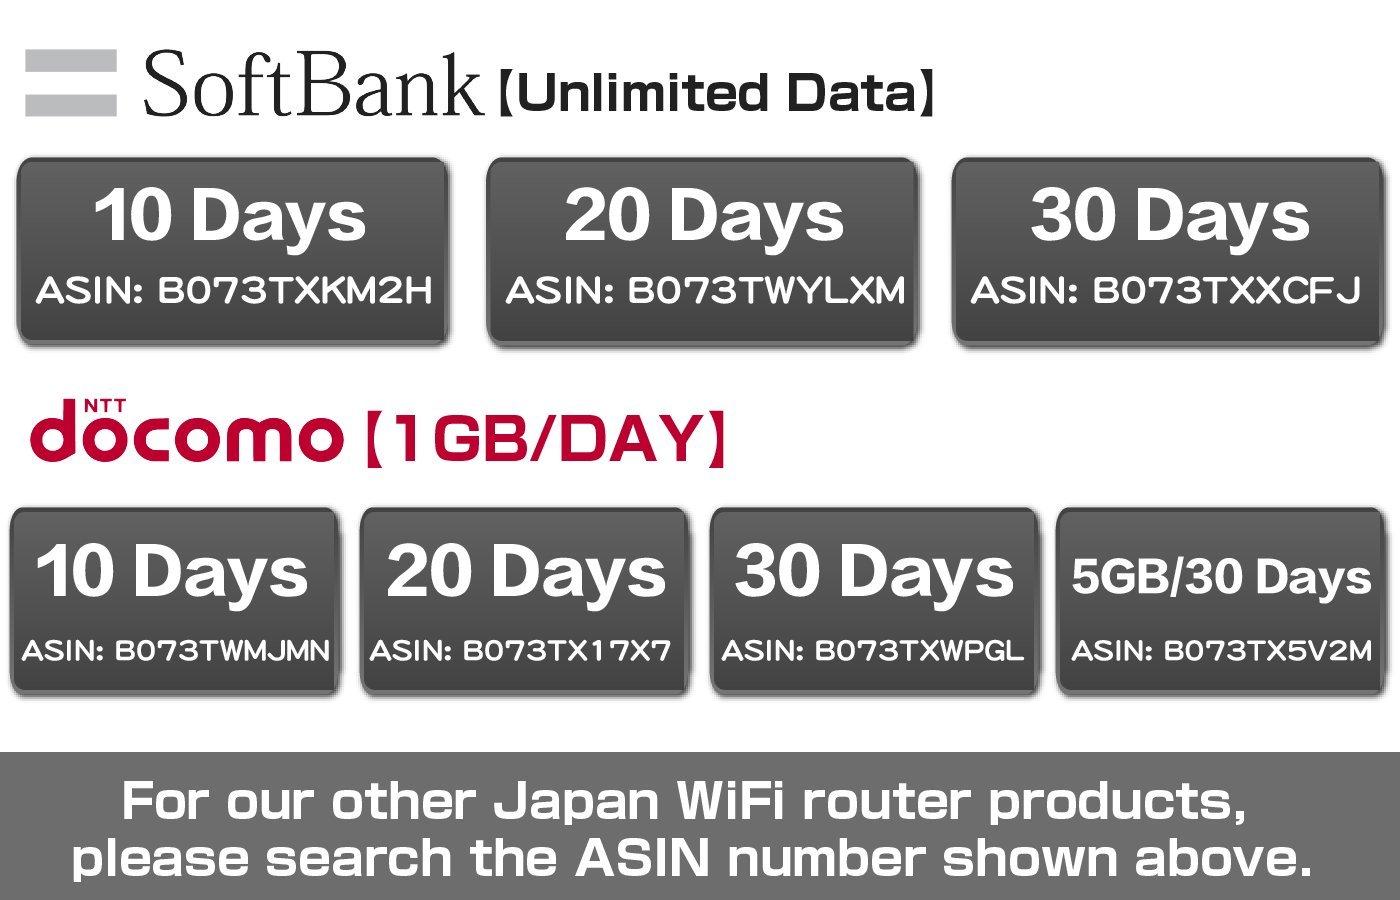 Softbank SIM Card 4G/LTE Japan Mobile WiFi Hotspot Rentals Unlimited - 10  Day